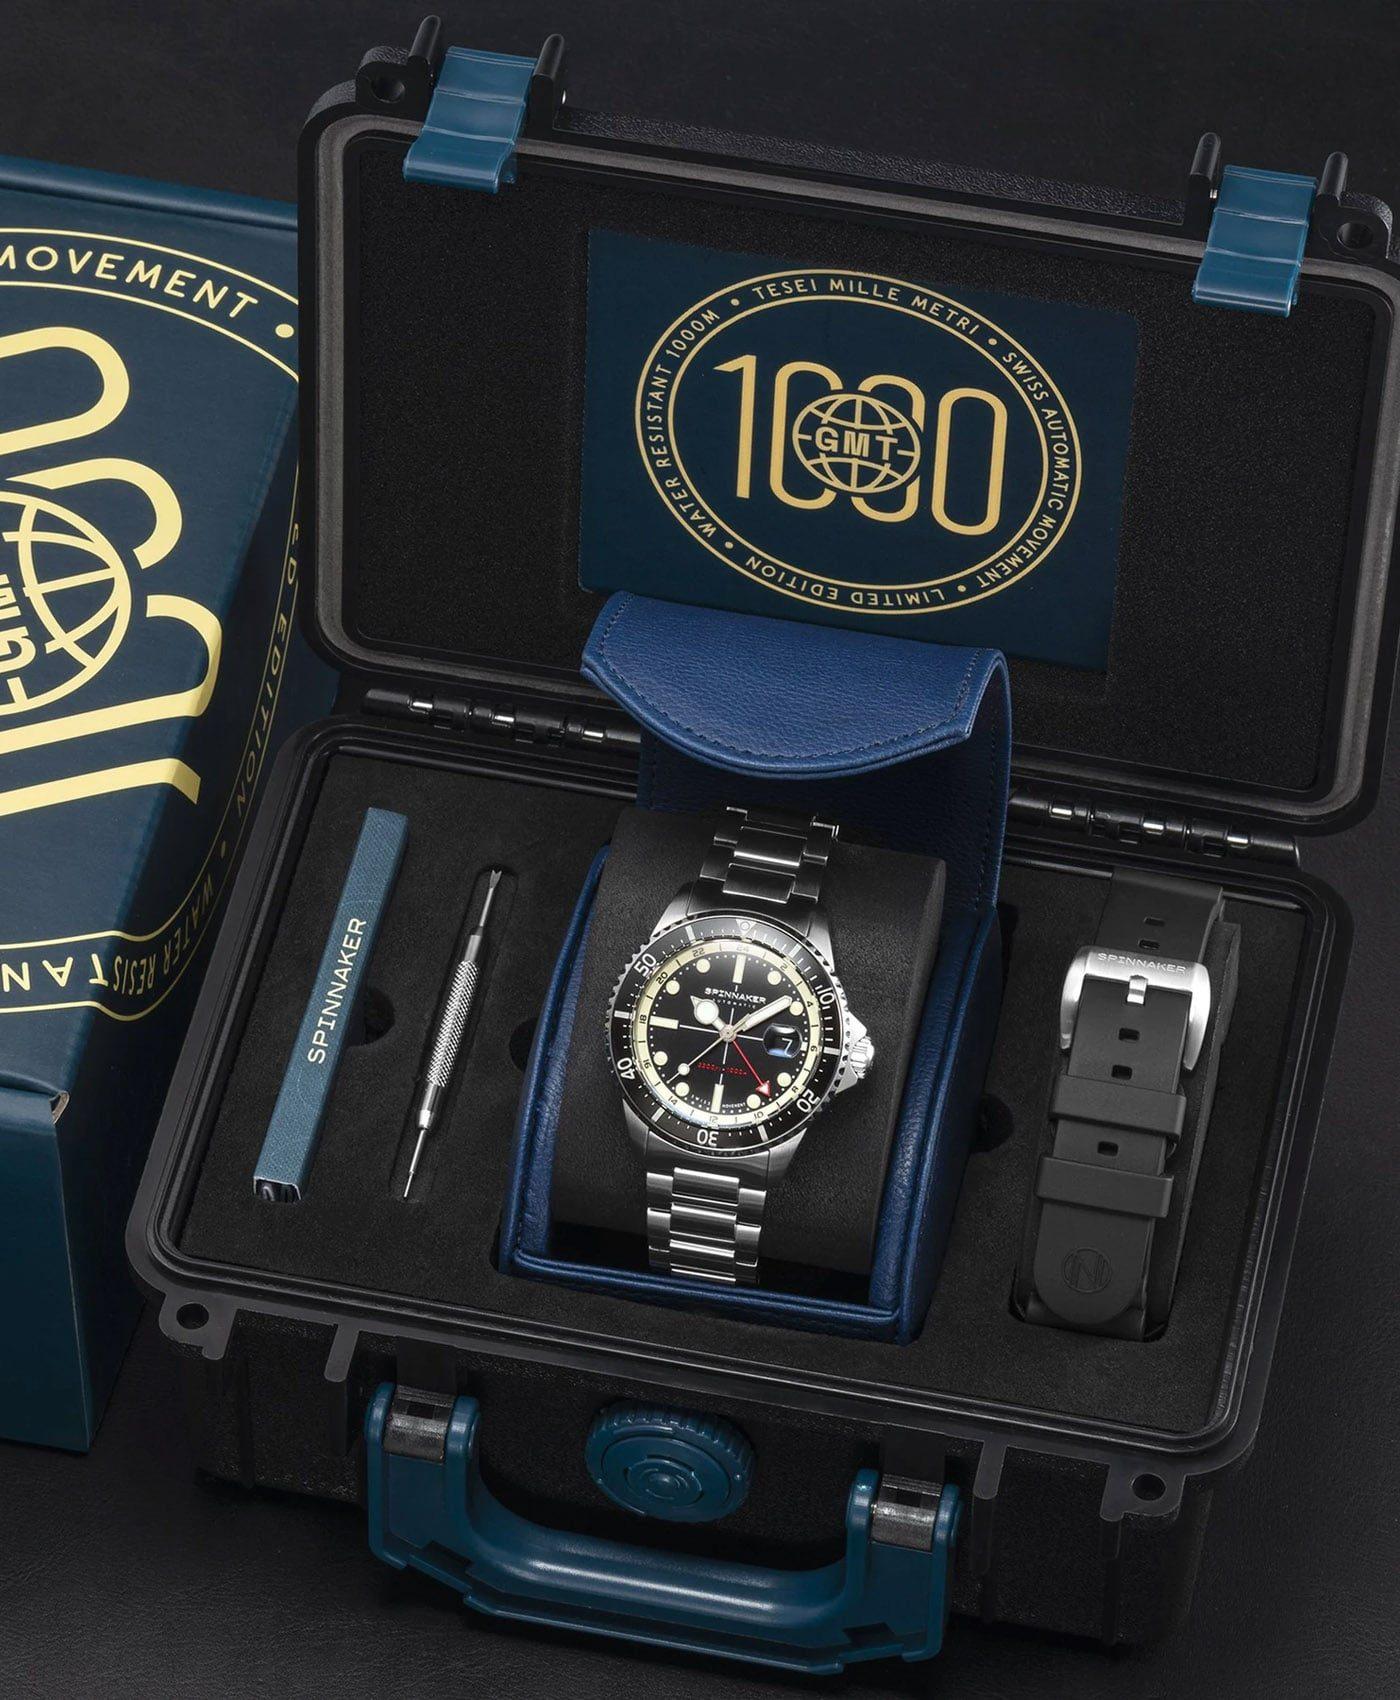 Spinnaker Tesei Mille Metri GMT - Midnight Black SP-5091-11 Box